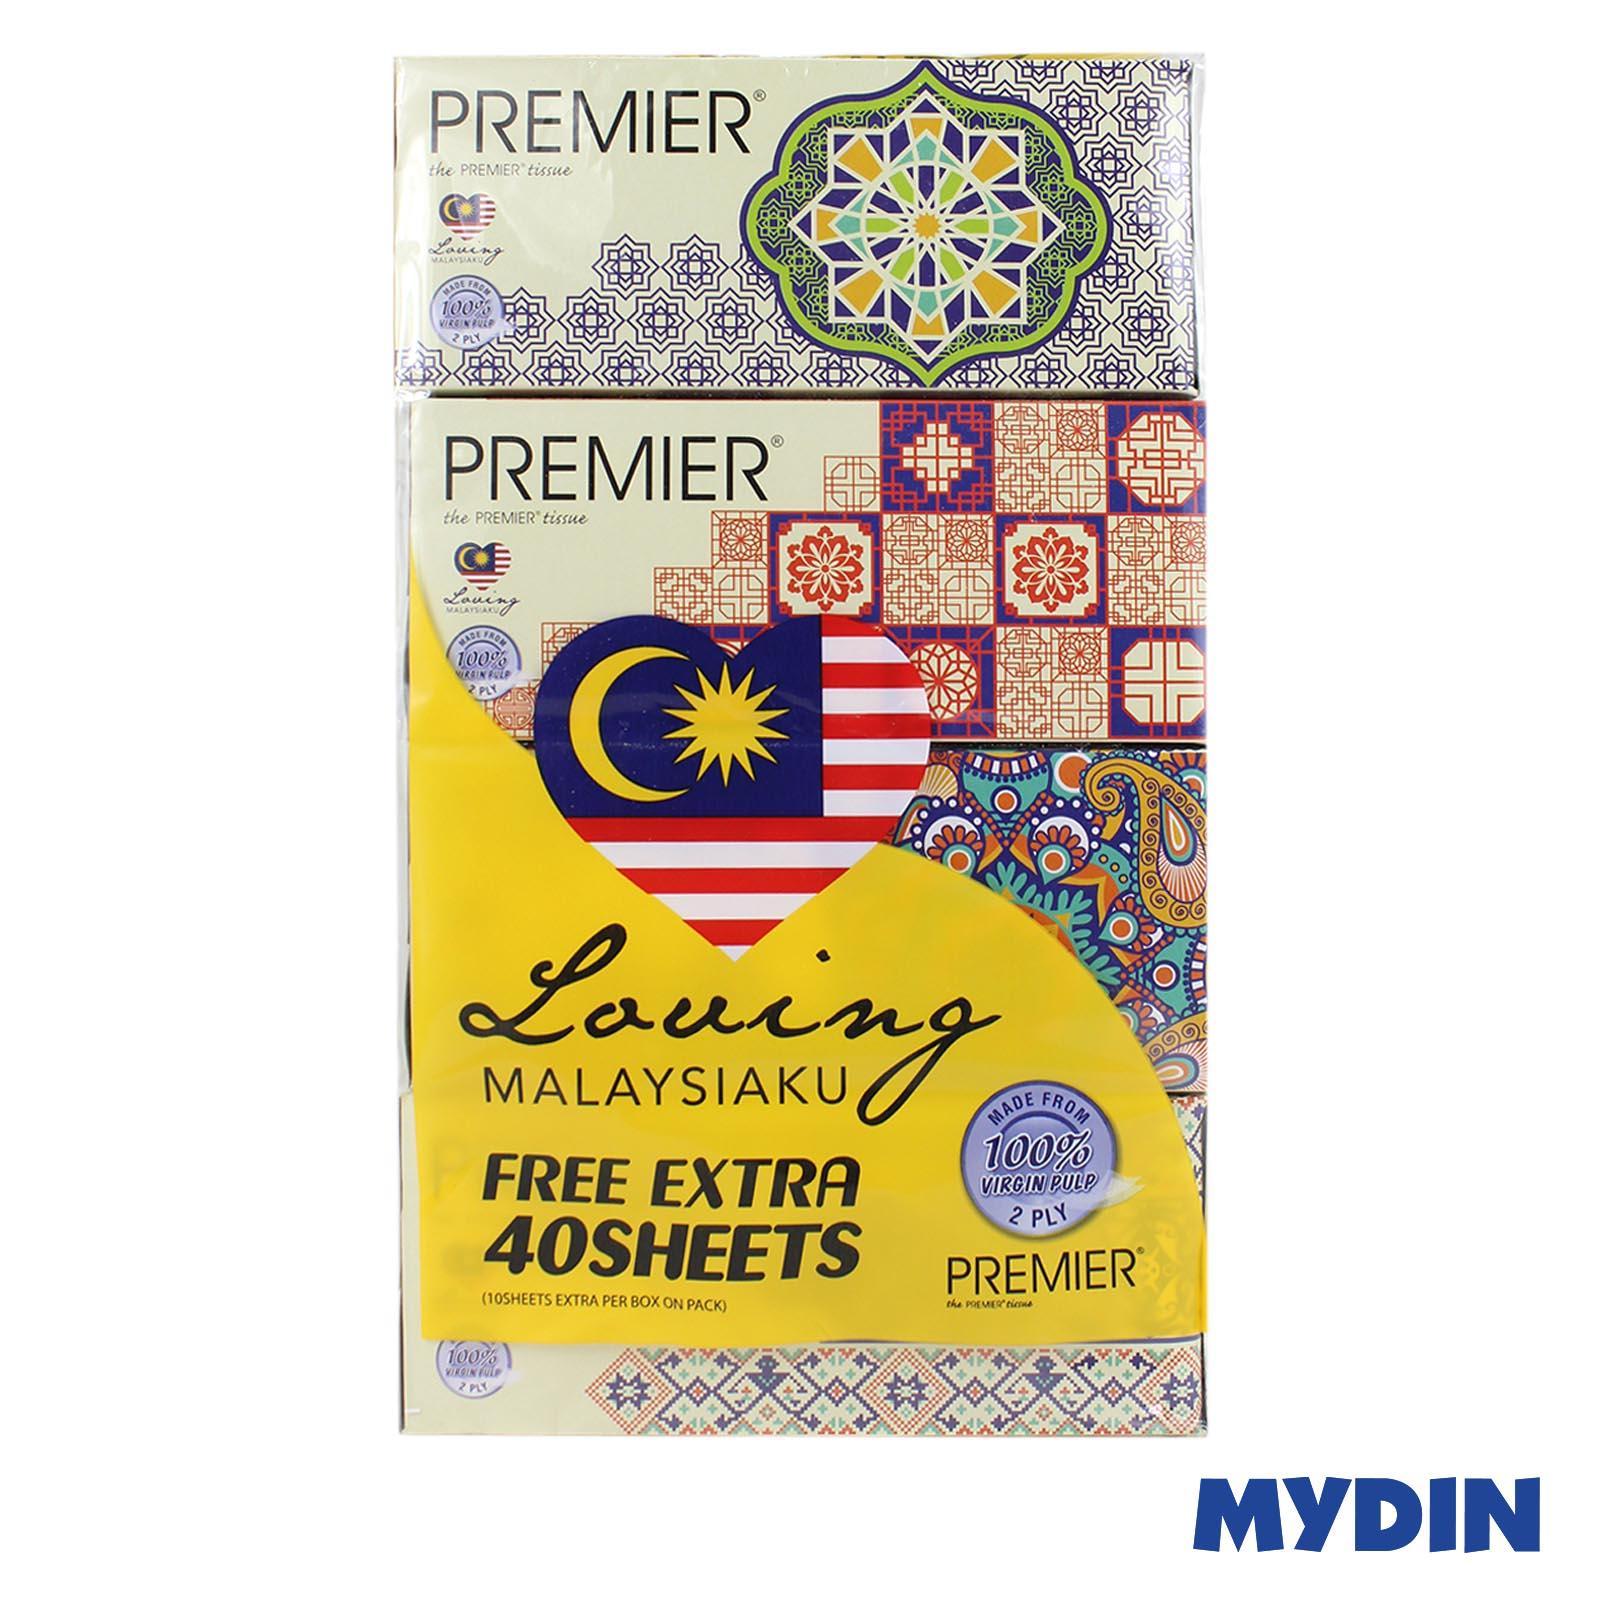 Premier Loving Malaysiaku Facial Tissue (2ply x 170's x 4 box)